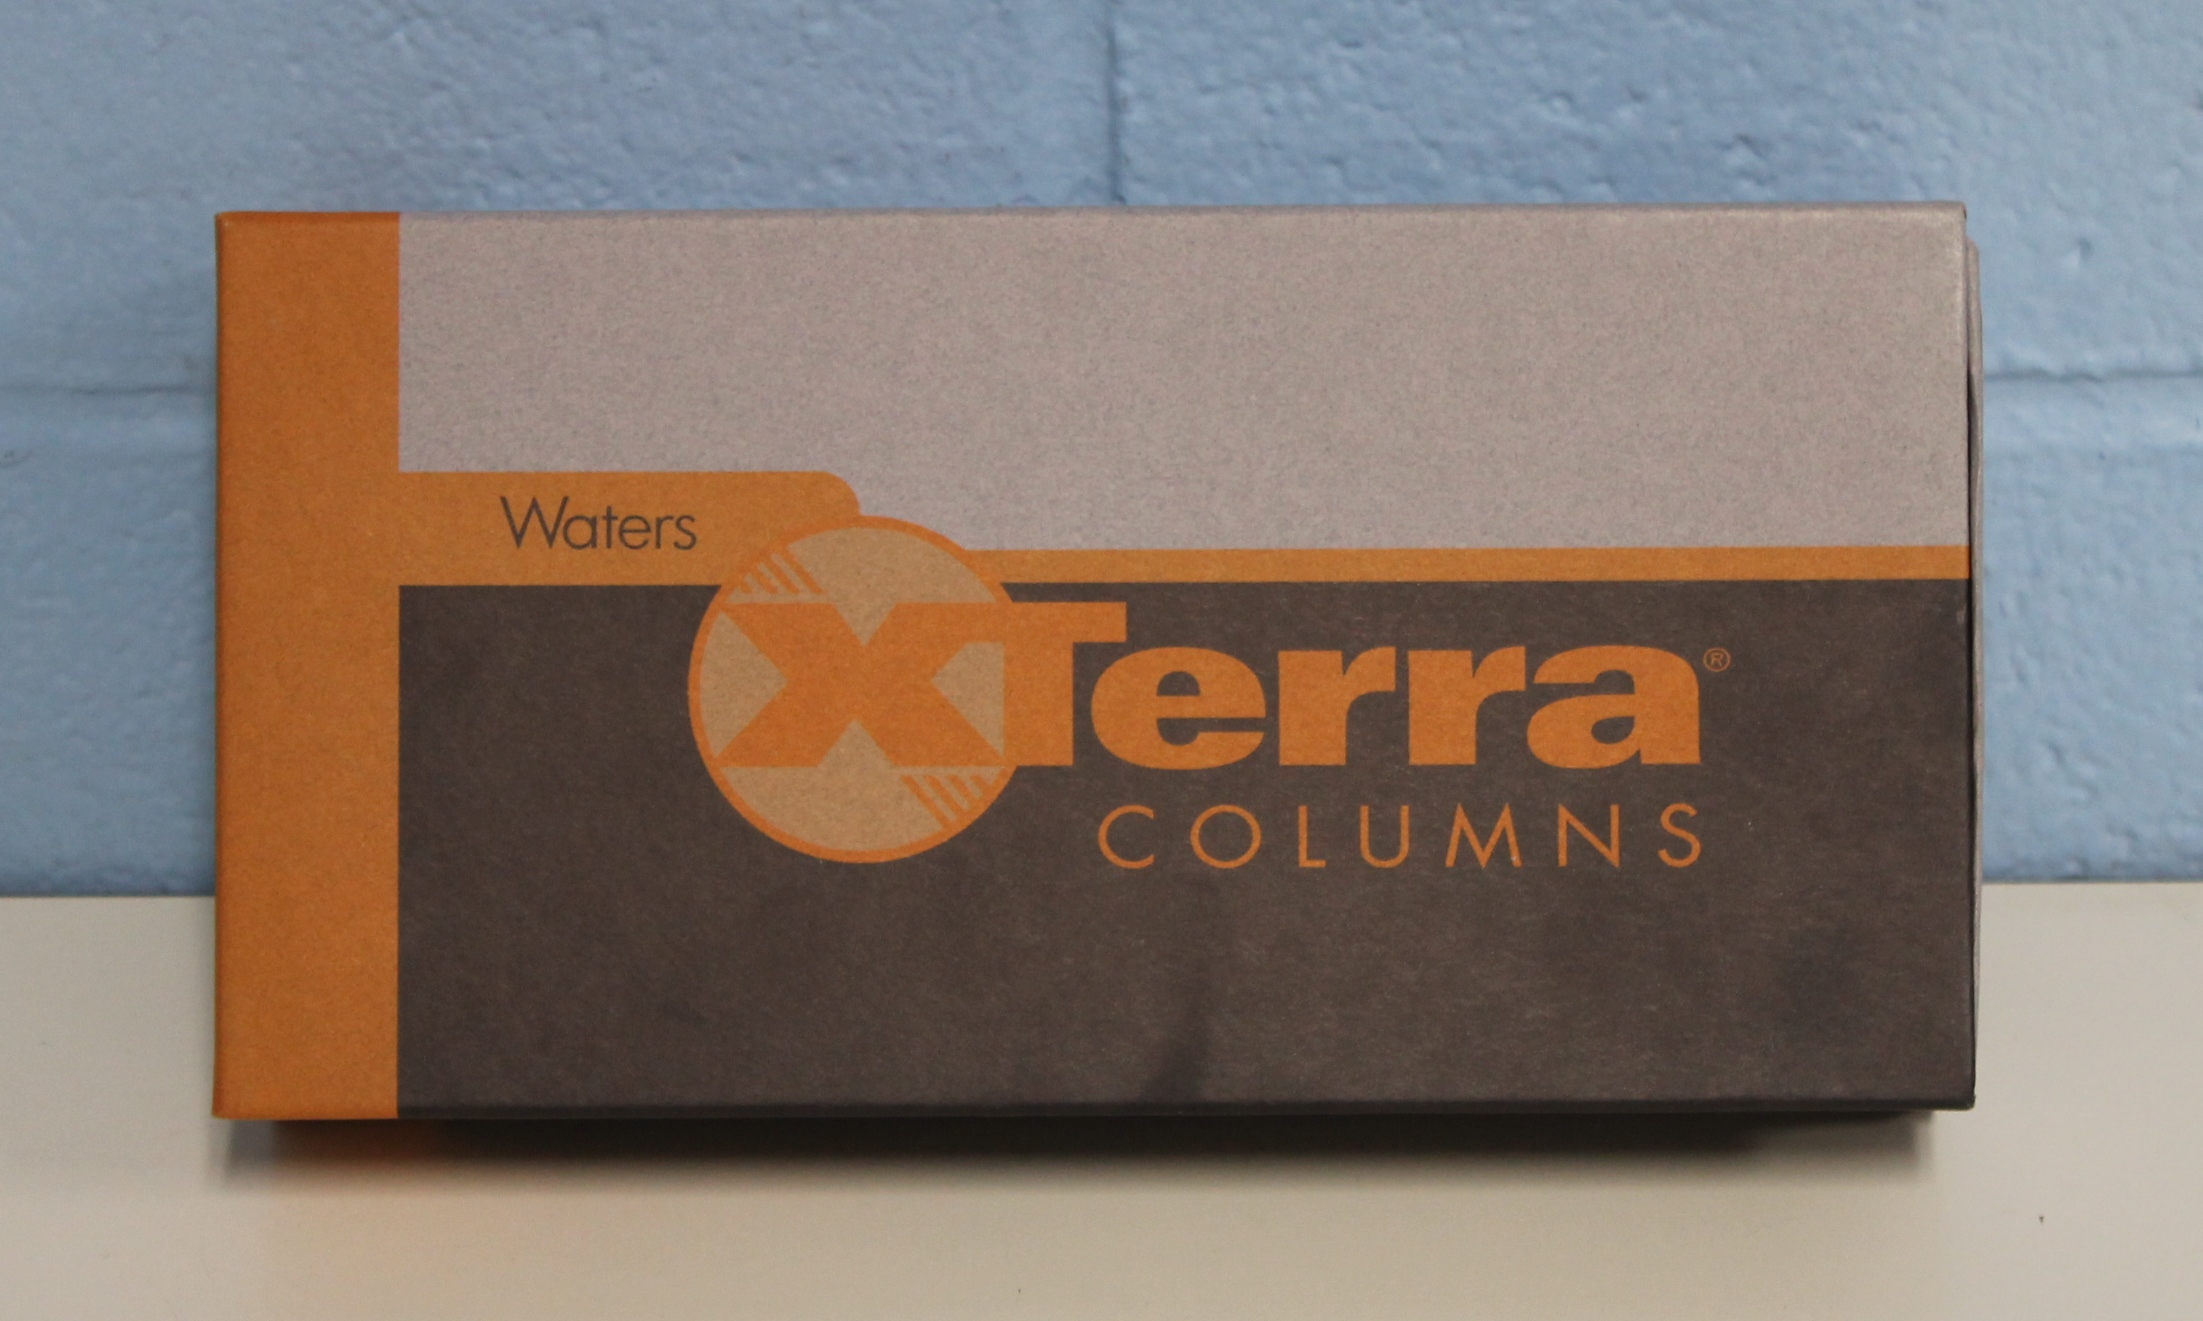 Waters Xterra MS C18 10 m, 3.0 x 50mm HPLC Column P/N 888000258 Image